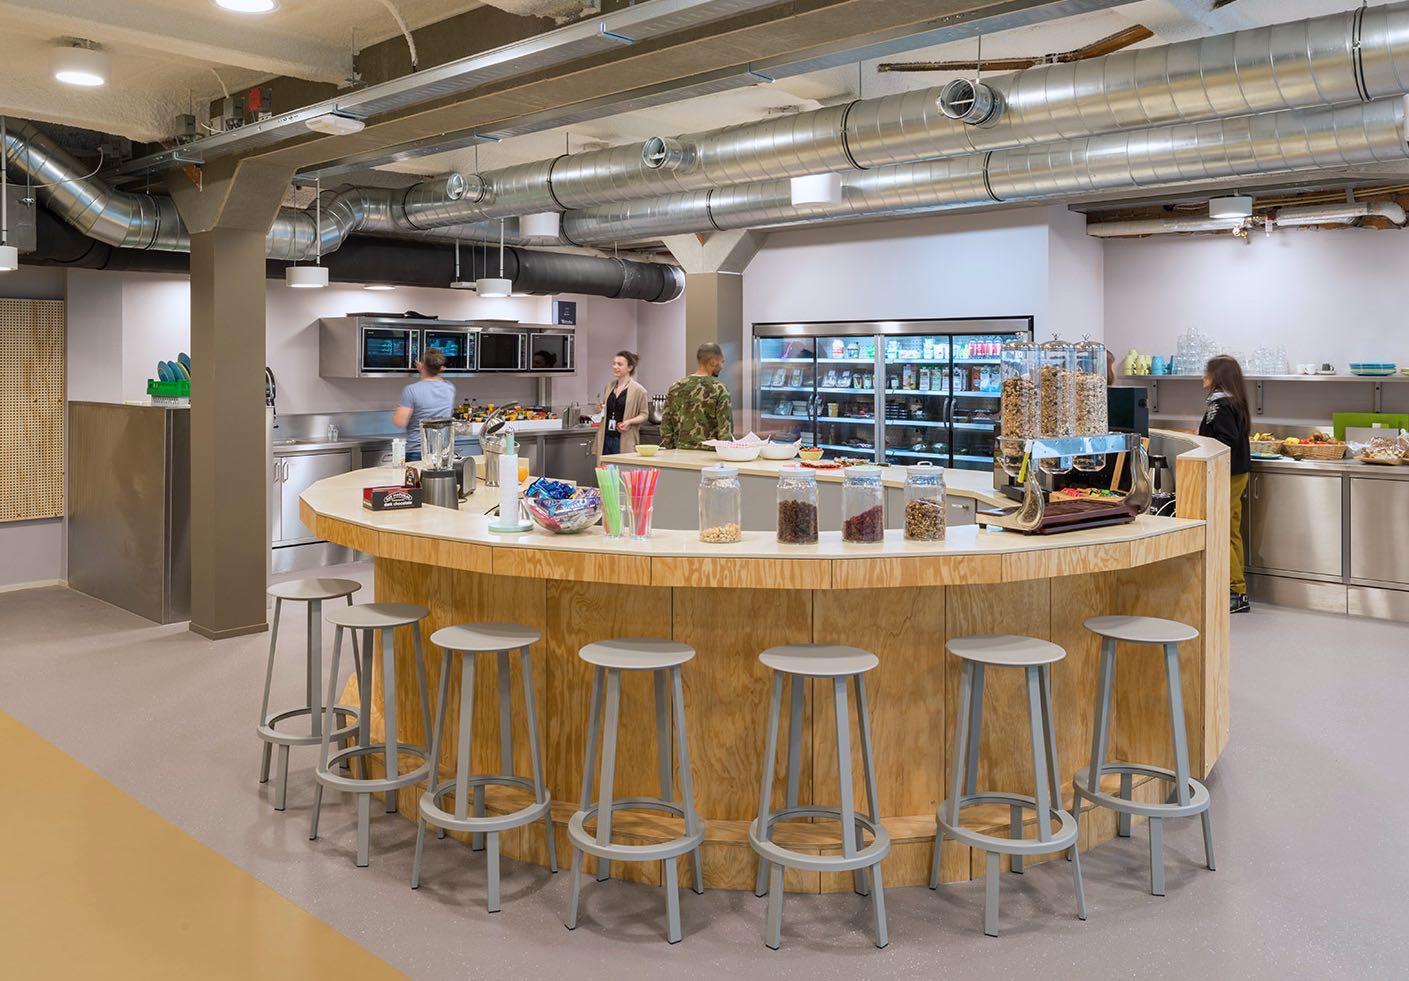 Fully stocked office kitchen